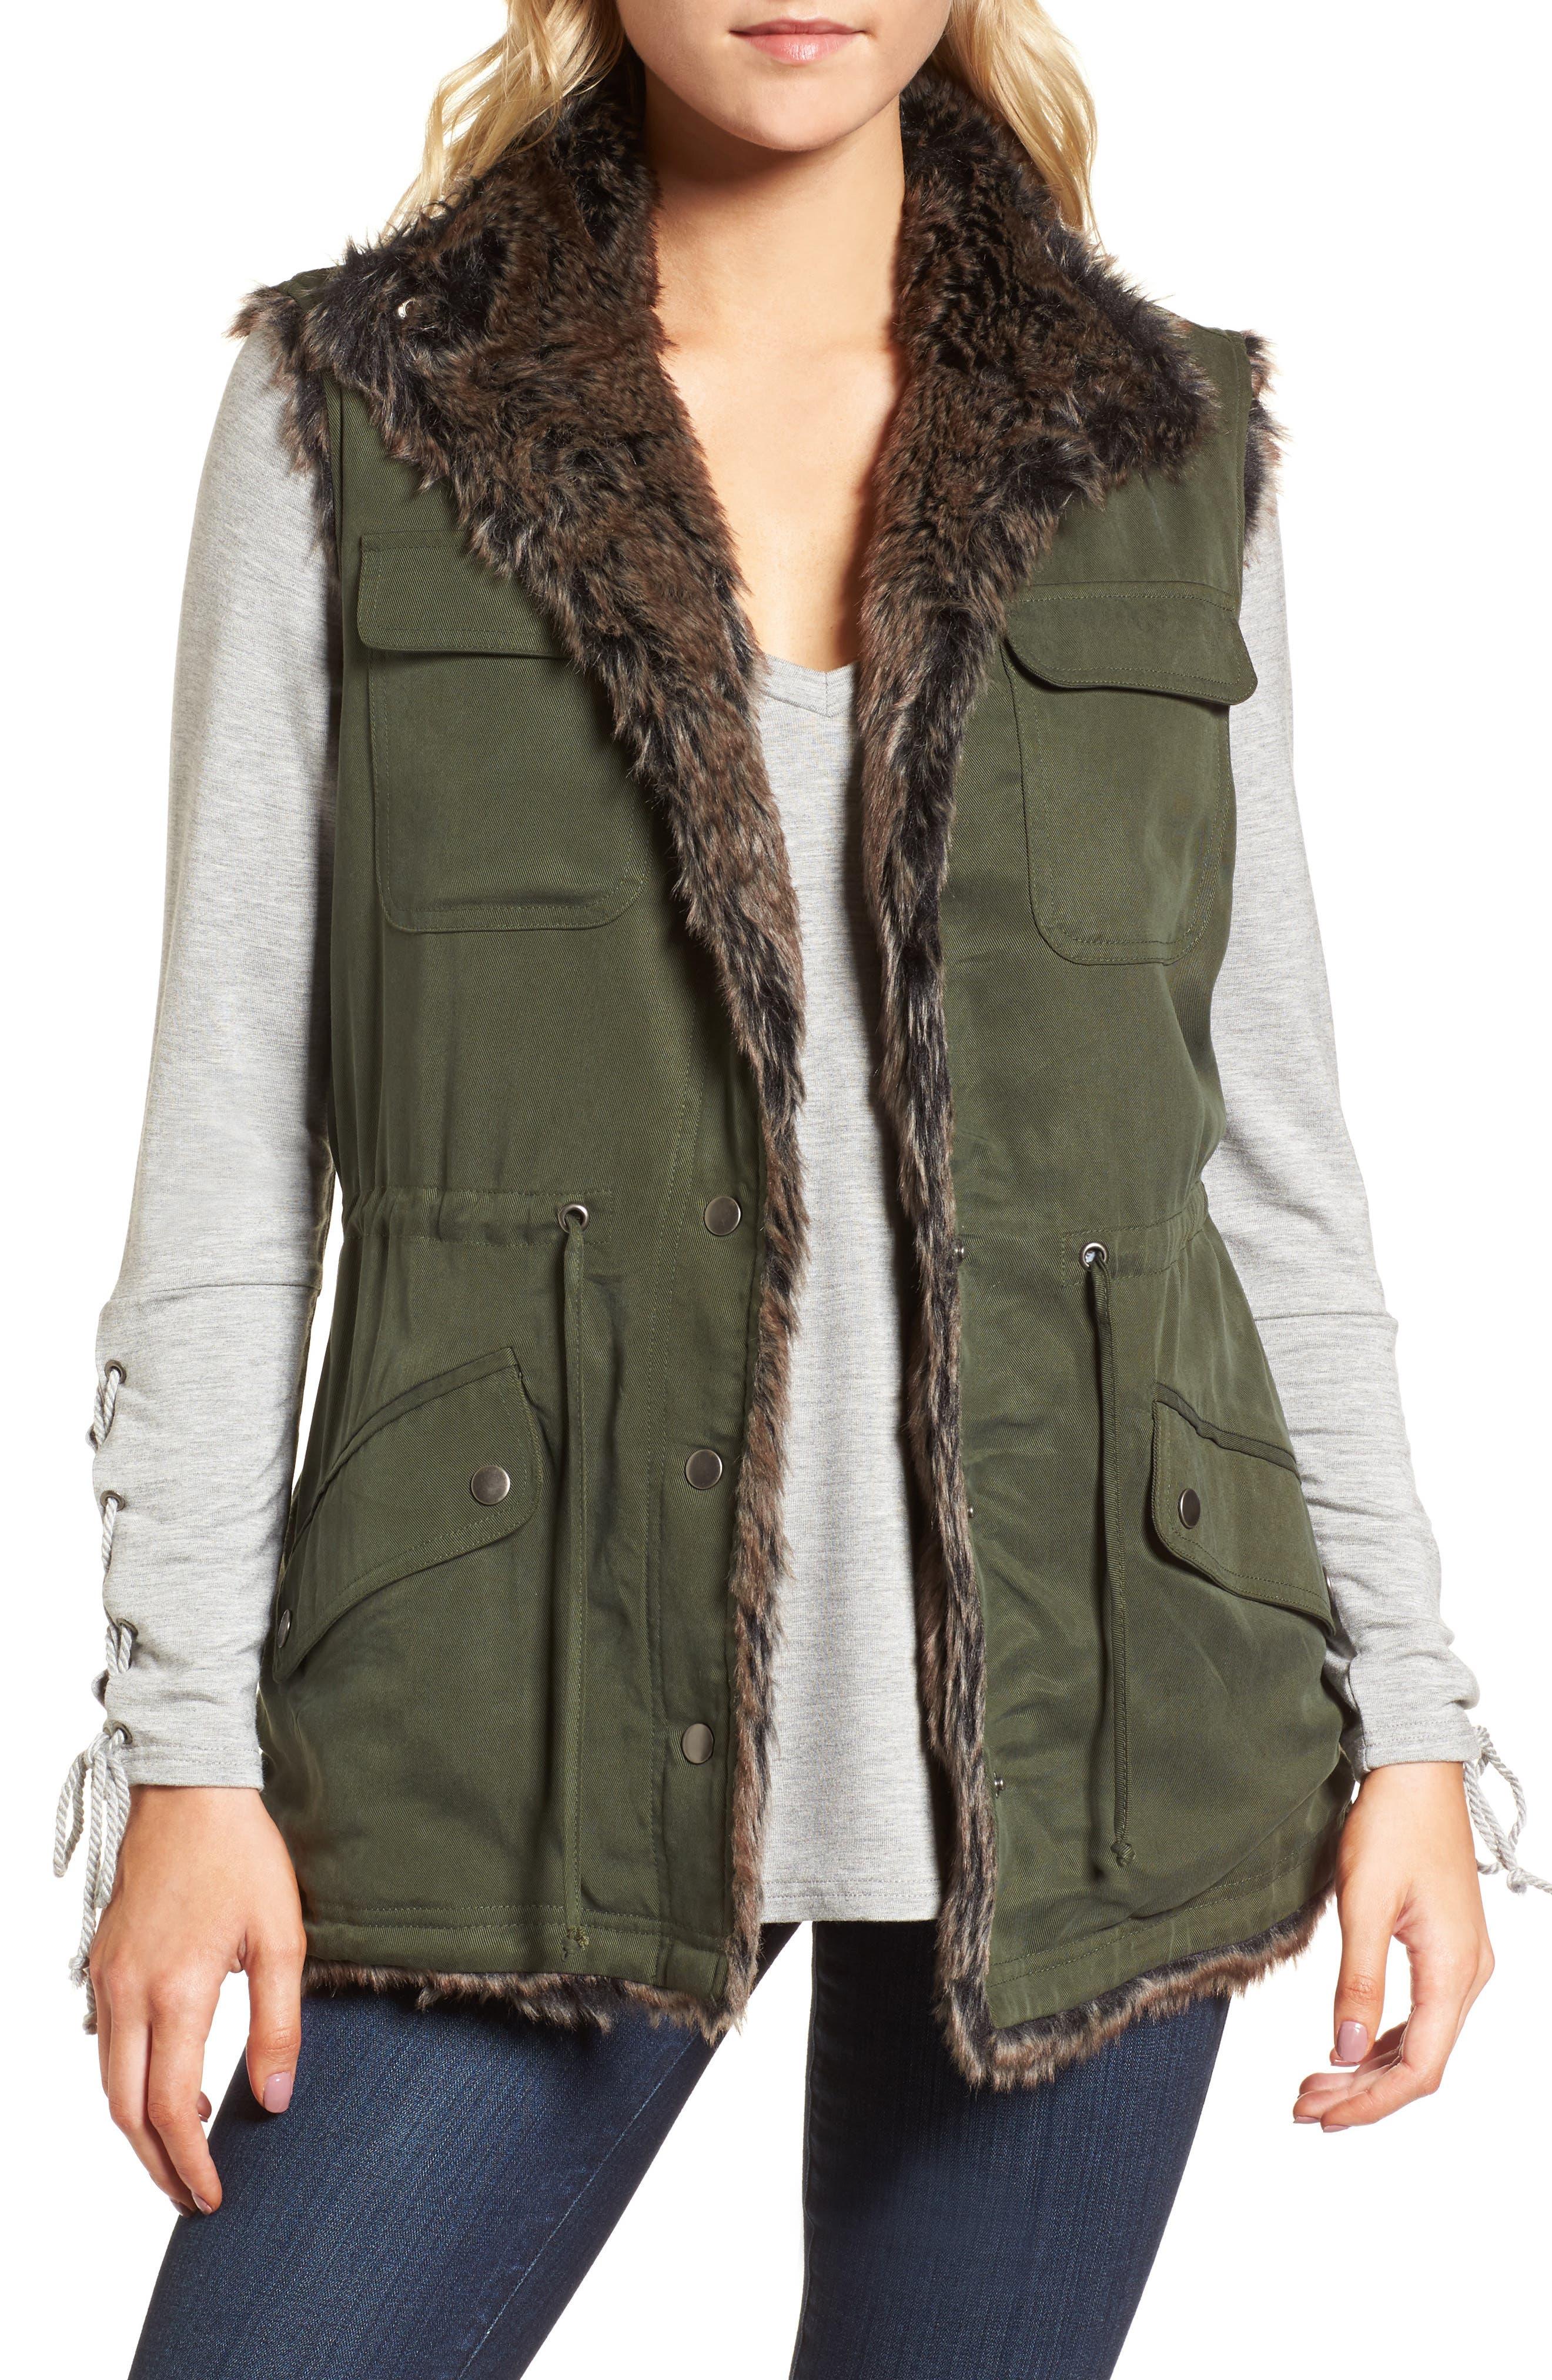 Ashling Faux Fur Lined Utility Vest,                             Main thumbnail 1, color,                             Army